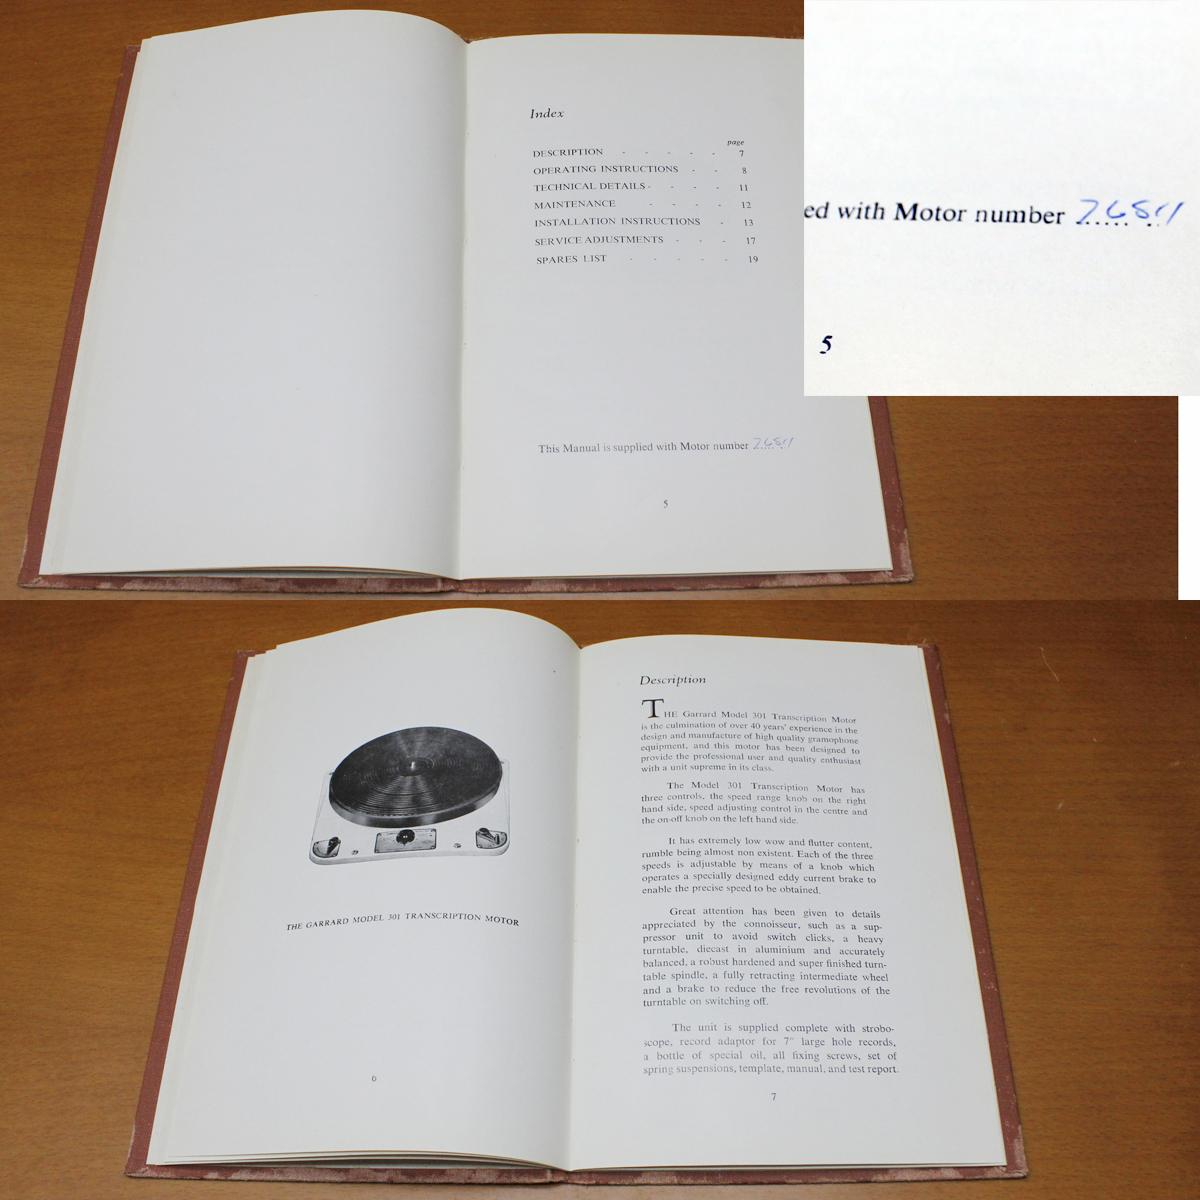 GARRARD301 manual[SN:768○○番台(星7)]ガラード英文取扱説明書 マニュアル おまけ日本語解説コピー付き_画像6